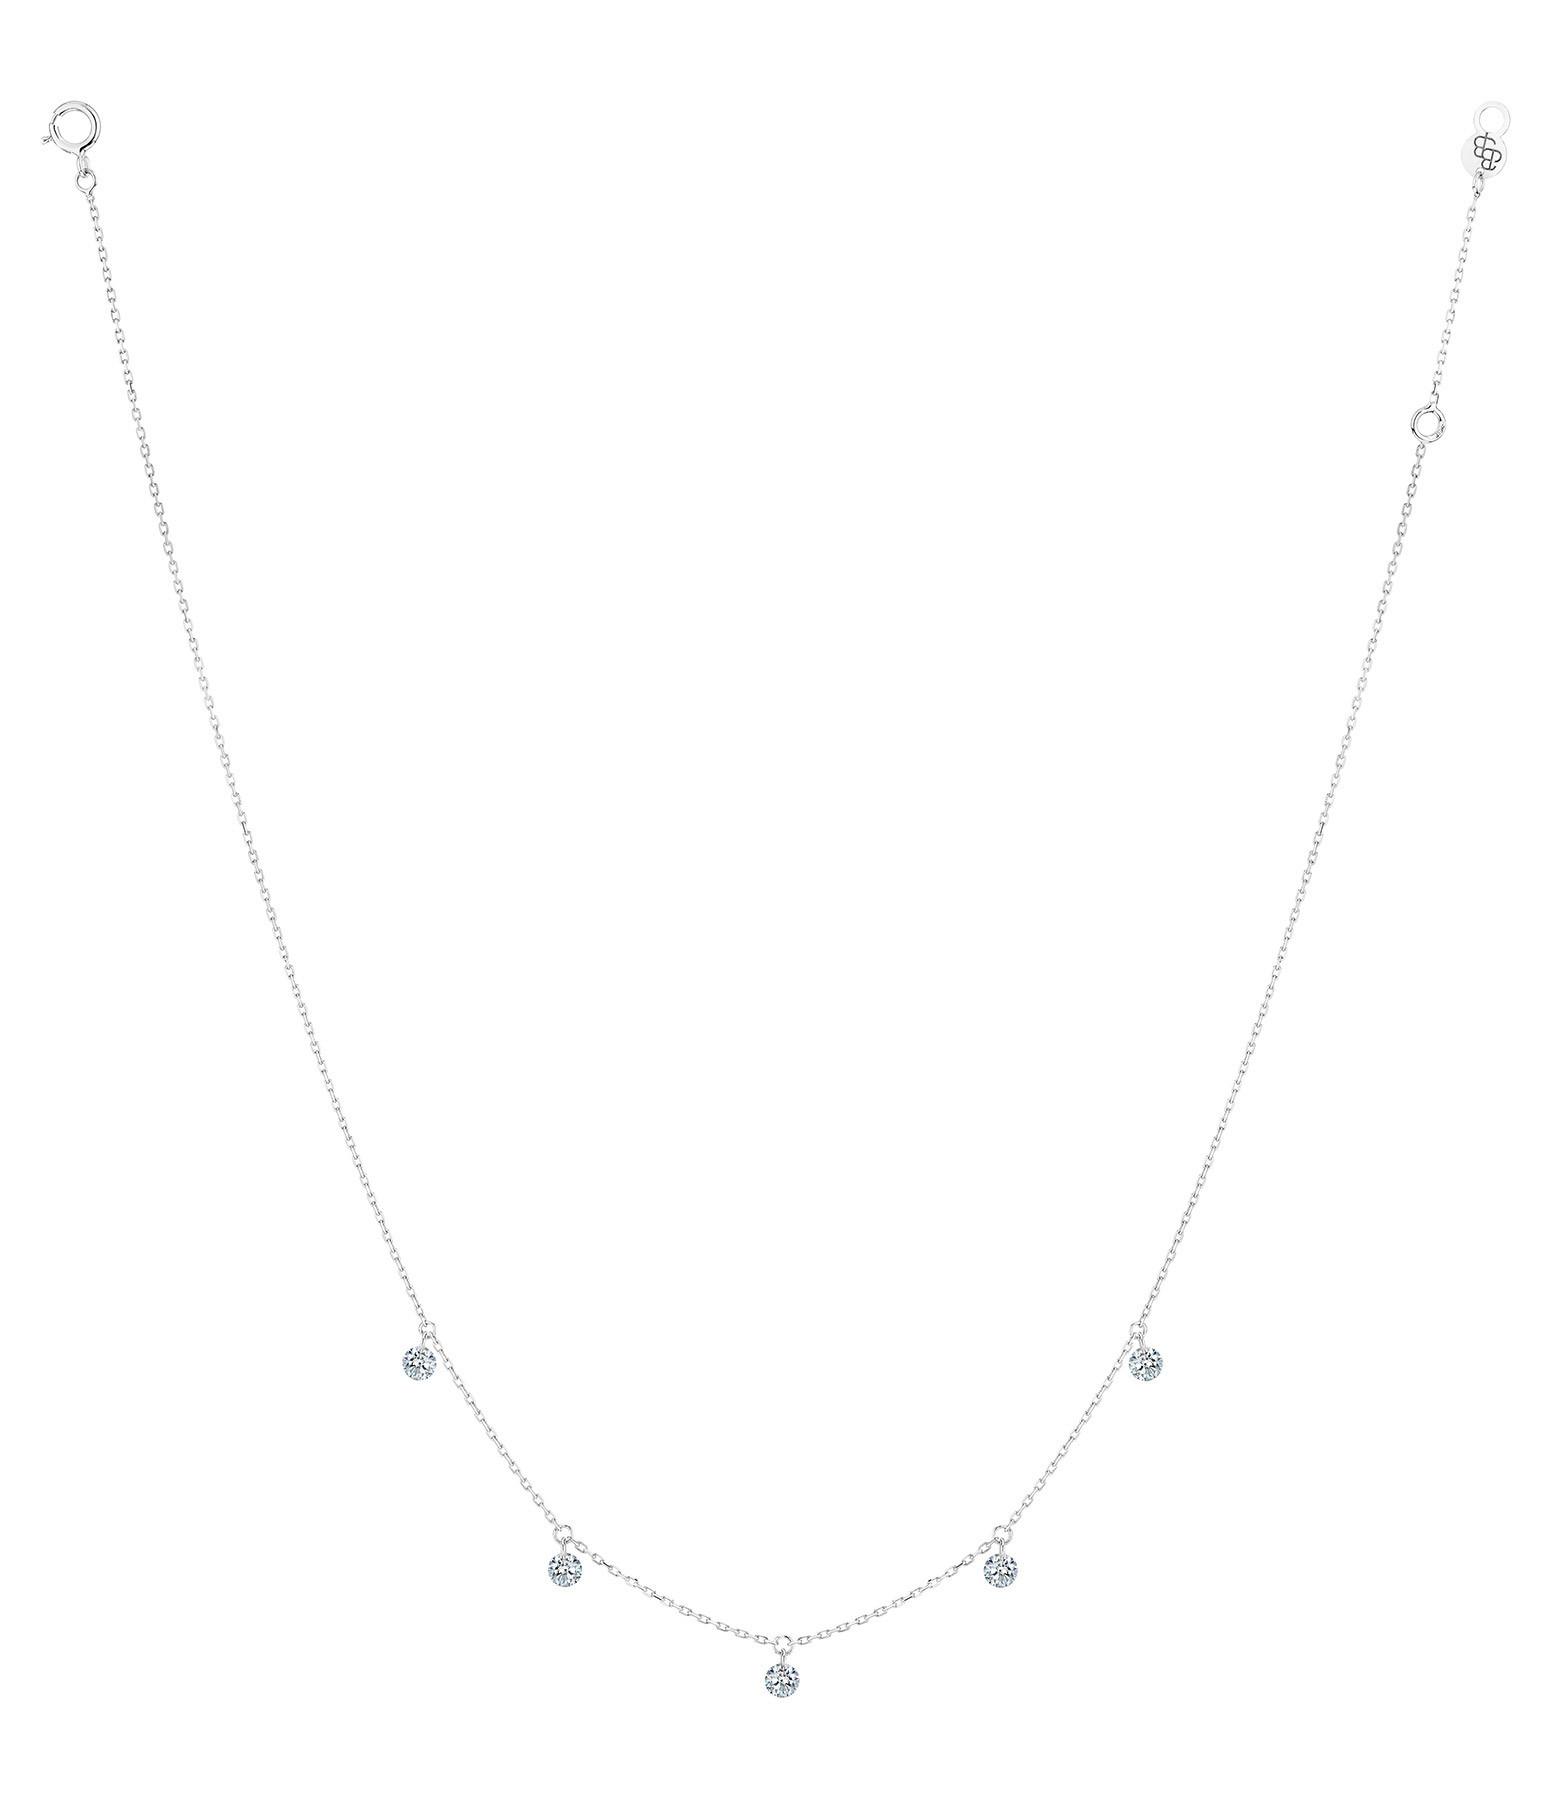 LA BRUNE & LA BLONDE - Collier 360° 5 Diamants Brillants Or Blanc